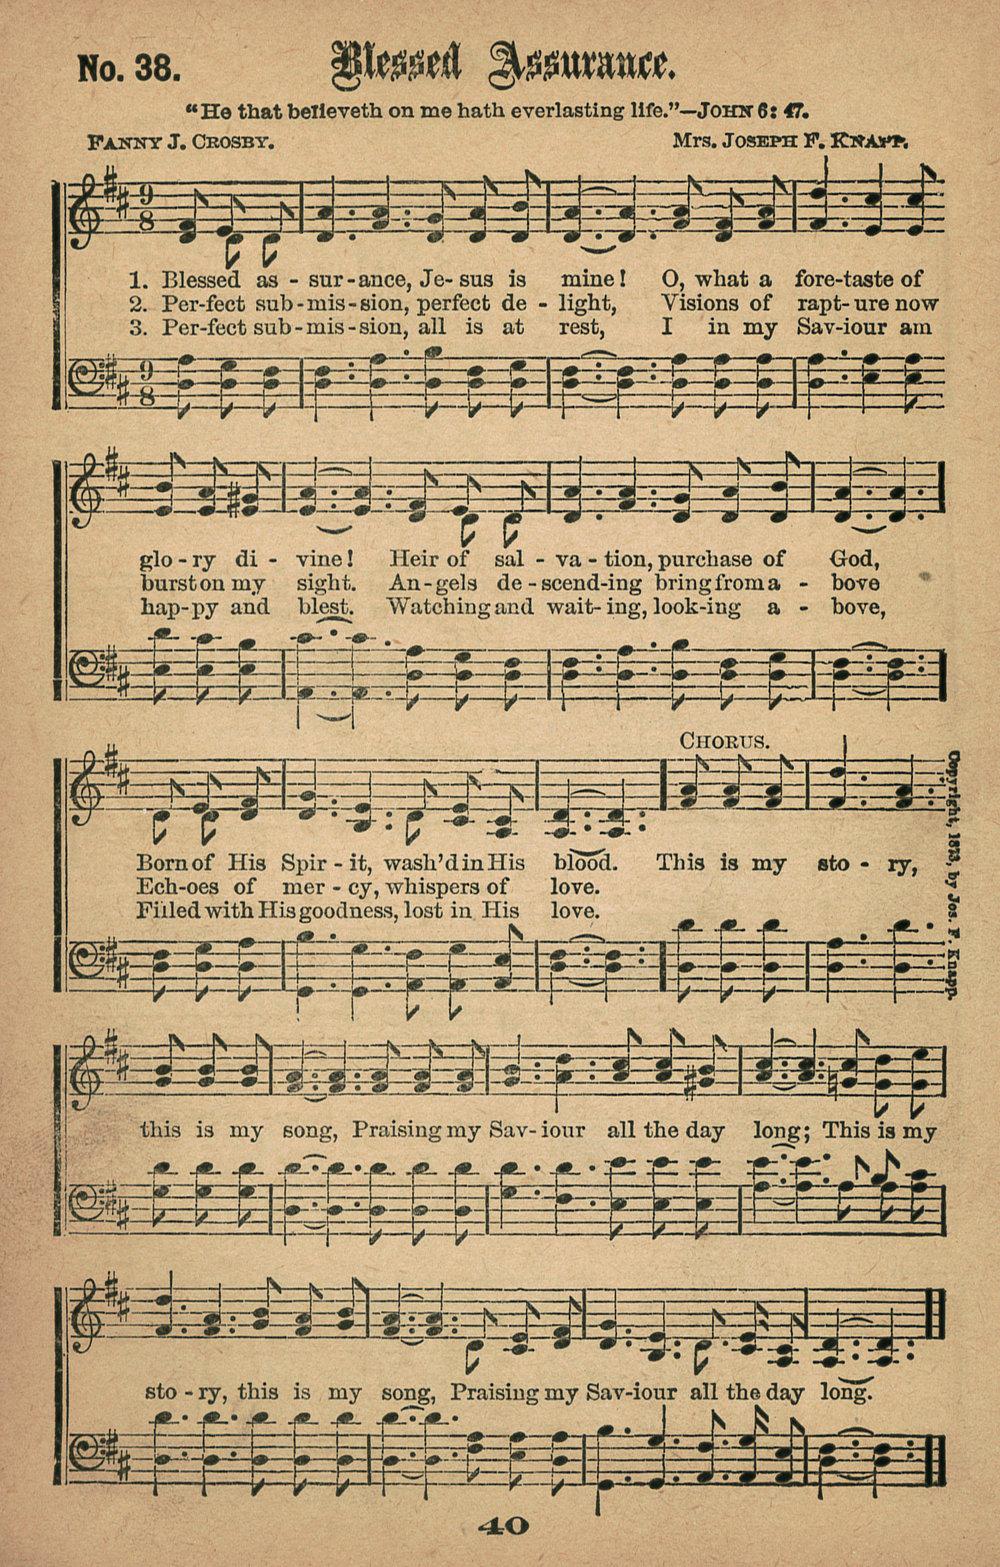 Fig. 2.   Gospel Hymns No. 5  (Chicago: Biglow & Main, 1887).